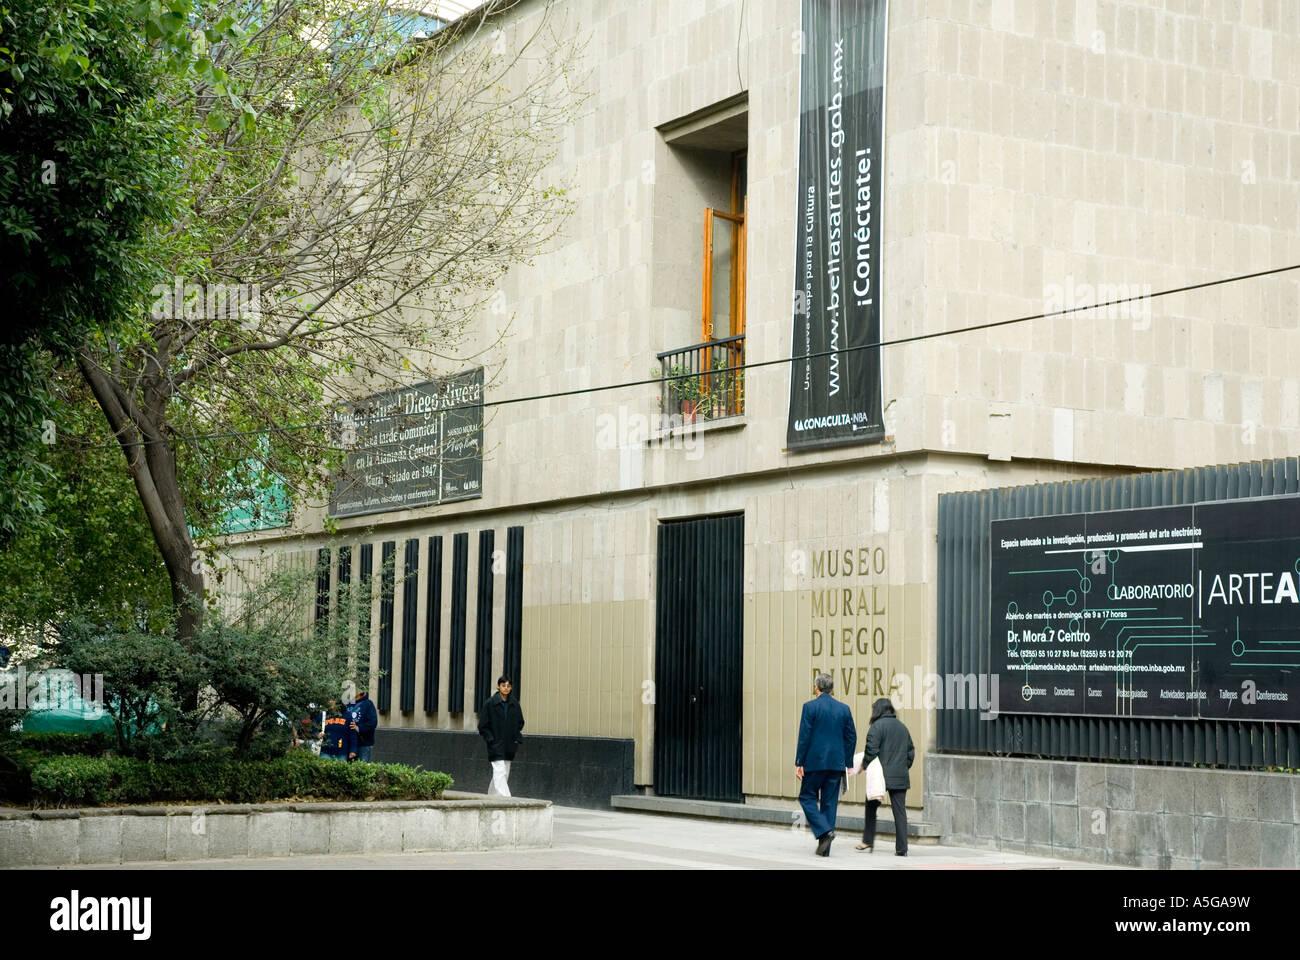 Museo Mural Diego Rivera Mexico City Stock Photo 11305620 Alamy